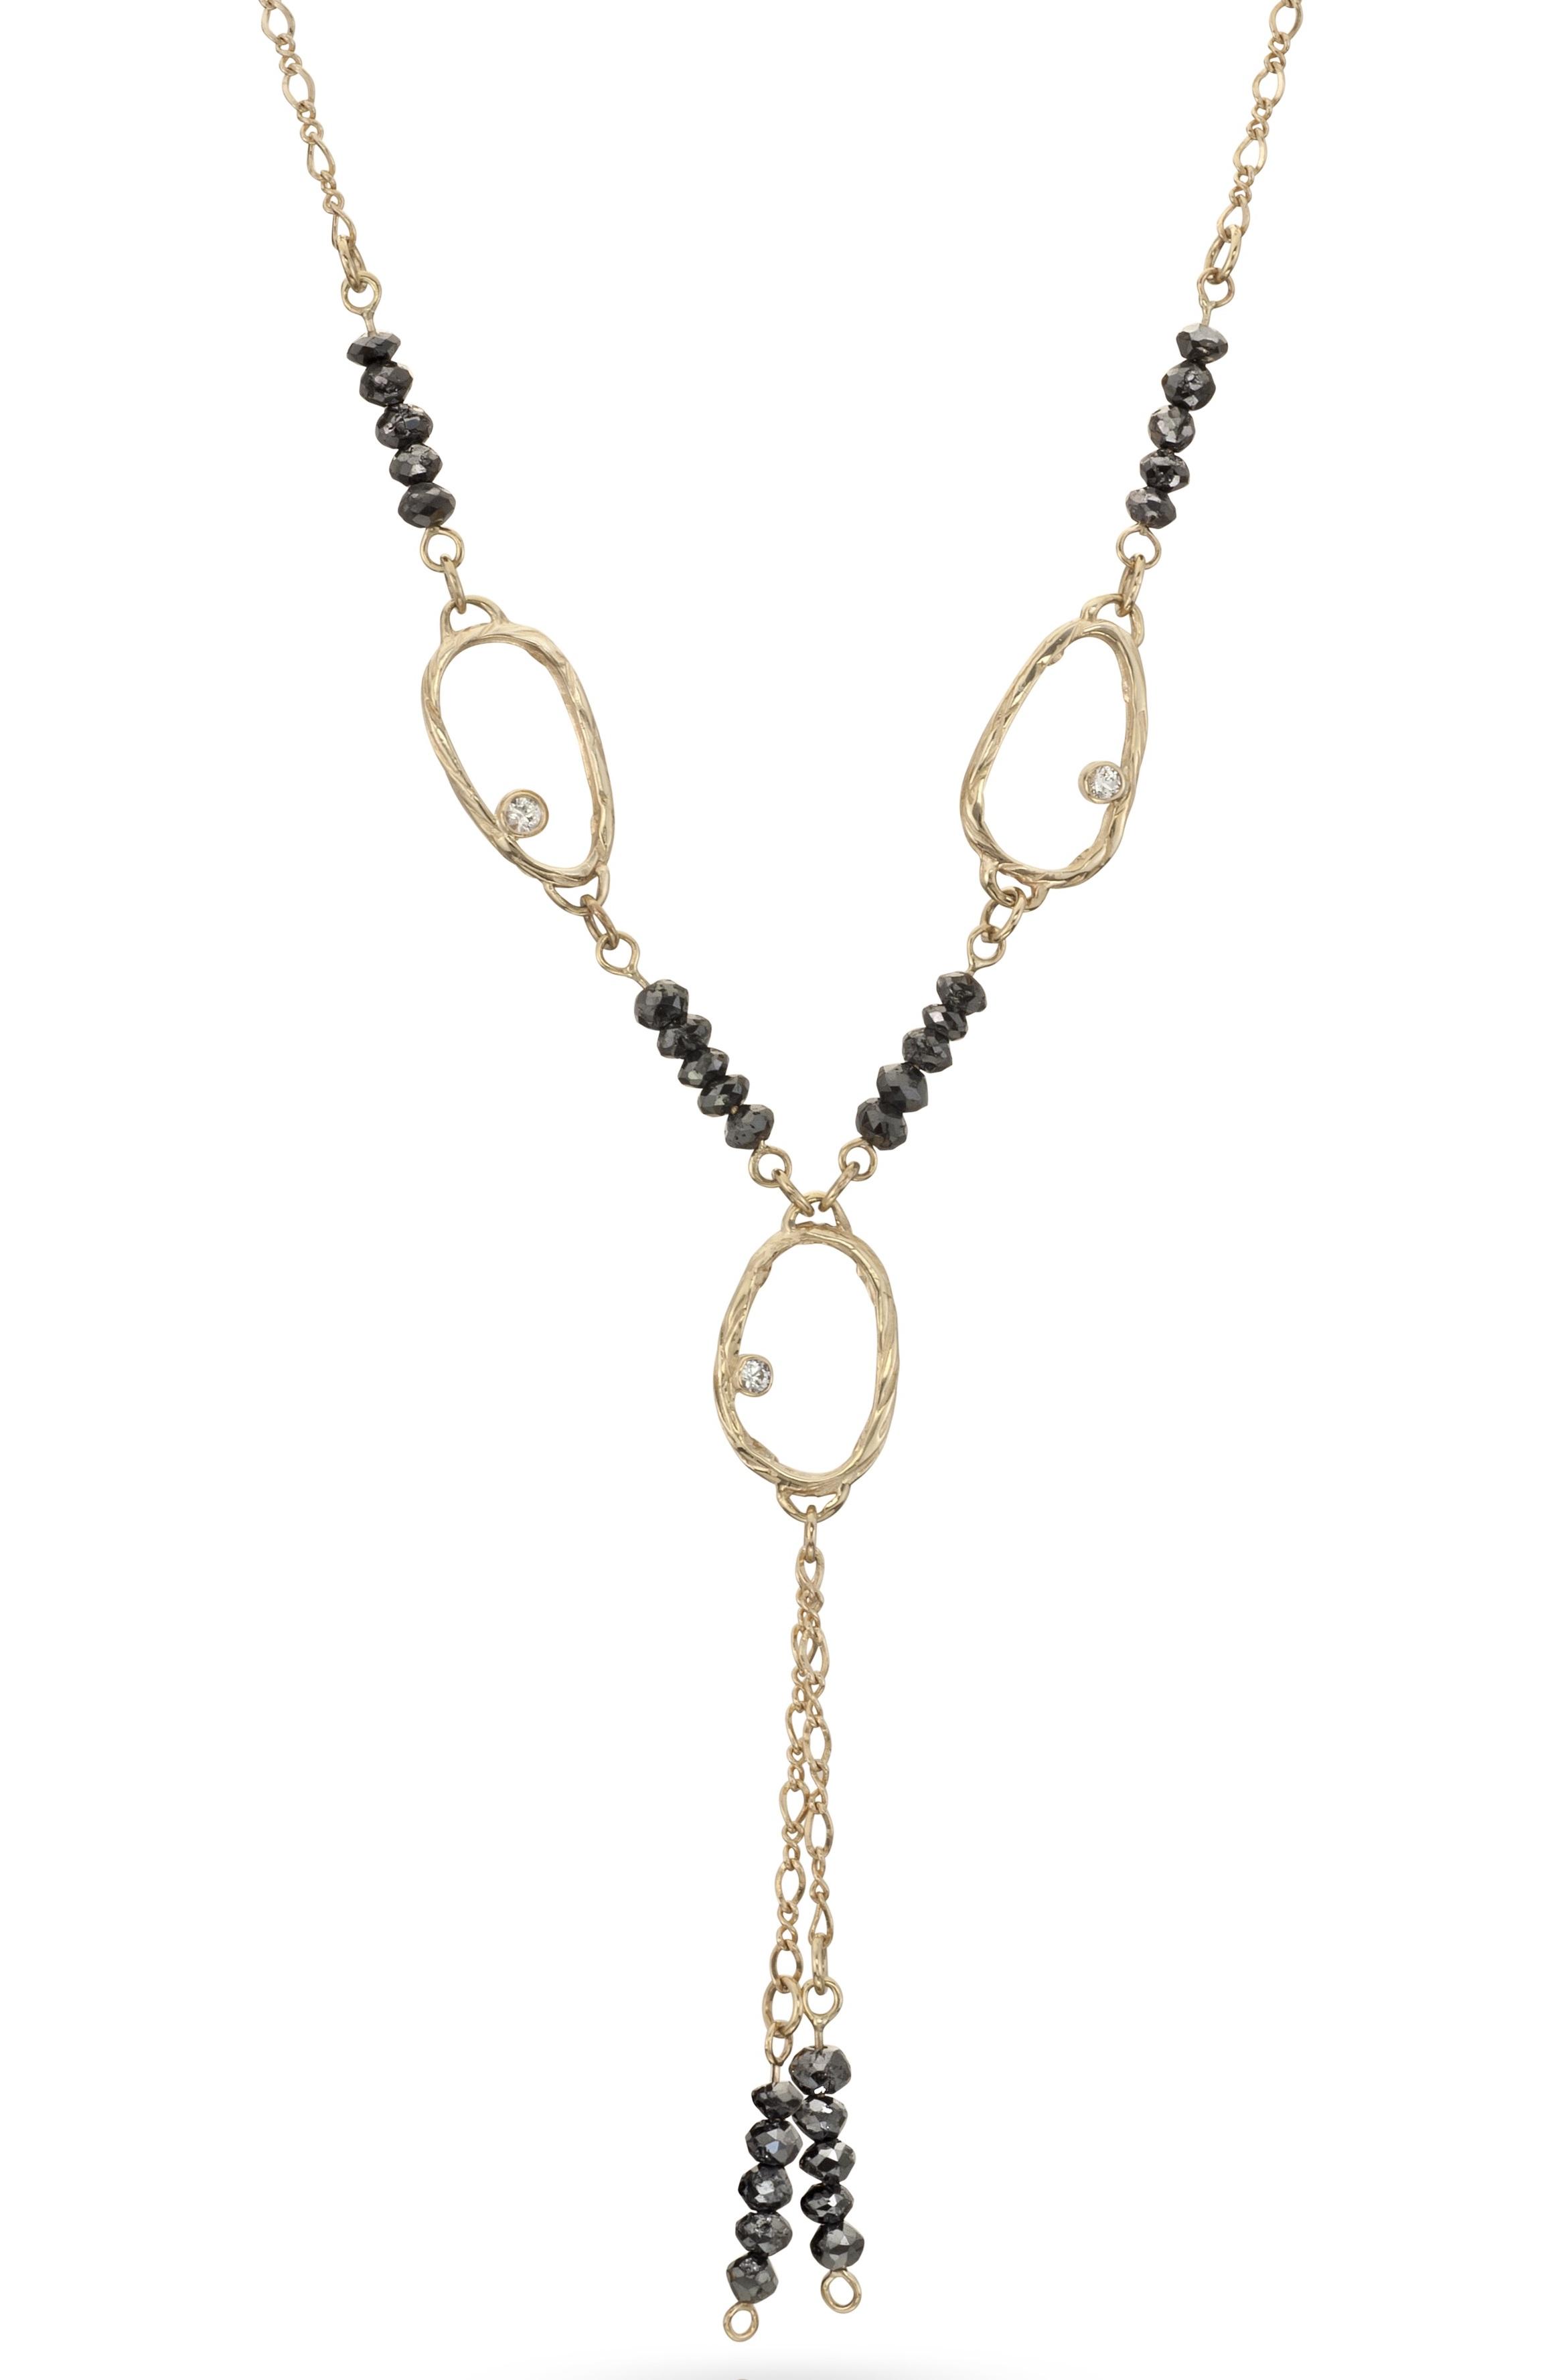 Alexis Barbeau black diamond Y necklace | JCK On Your Market